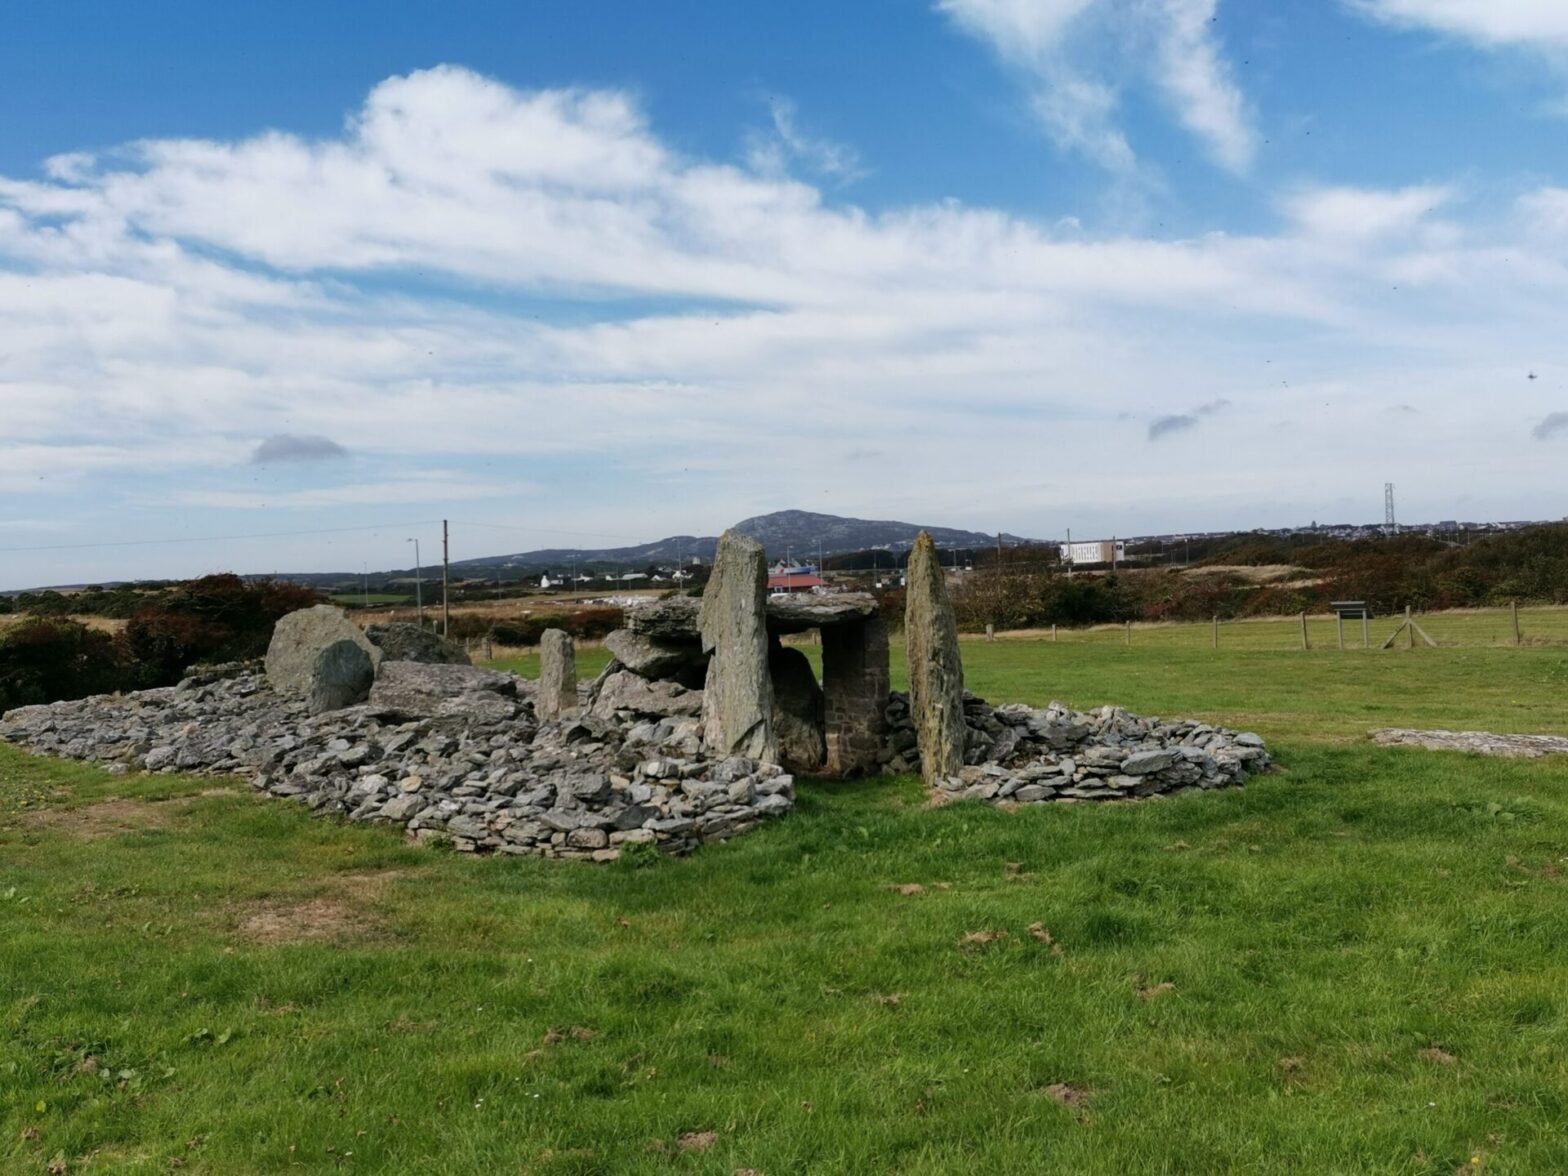 Trefignath prehistoric burial chamber, visited on Prehistric Ynys Cybi Bike Tour, Anglesey